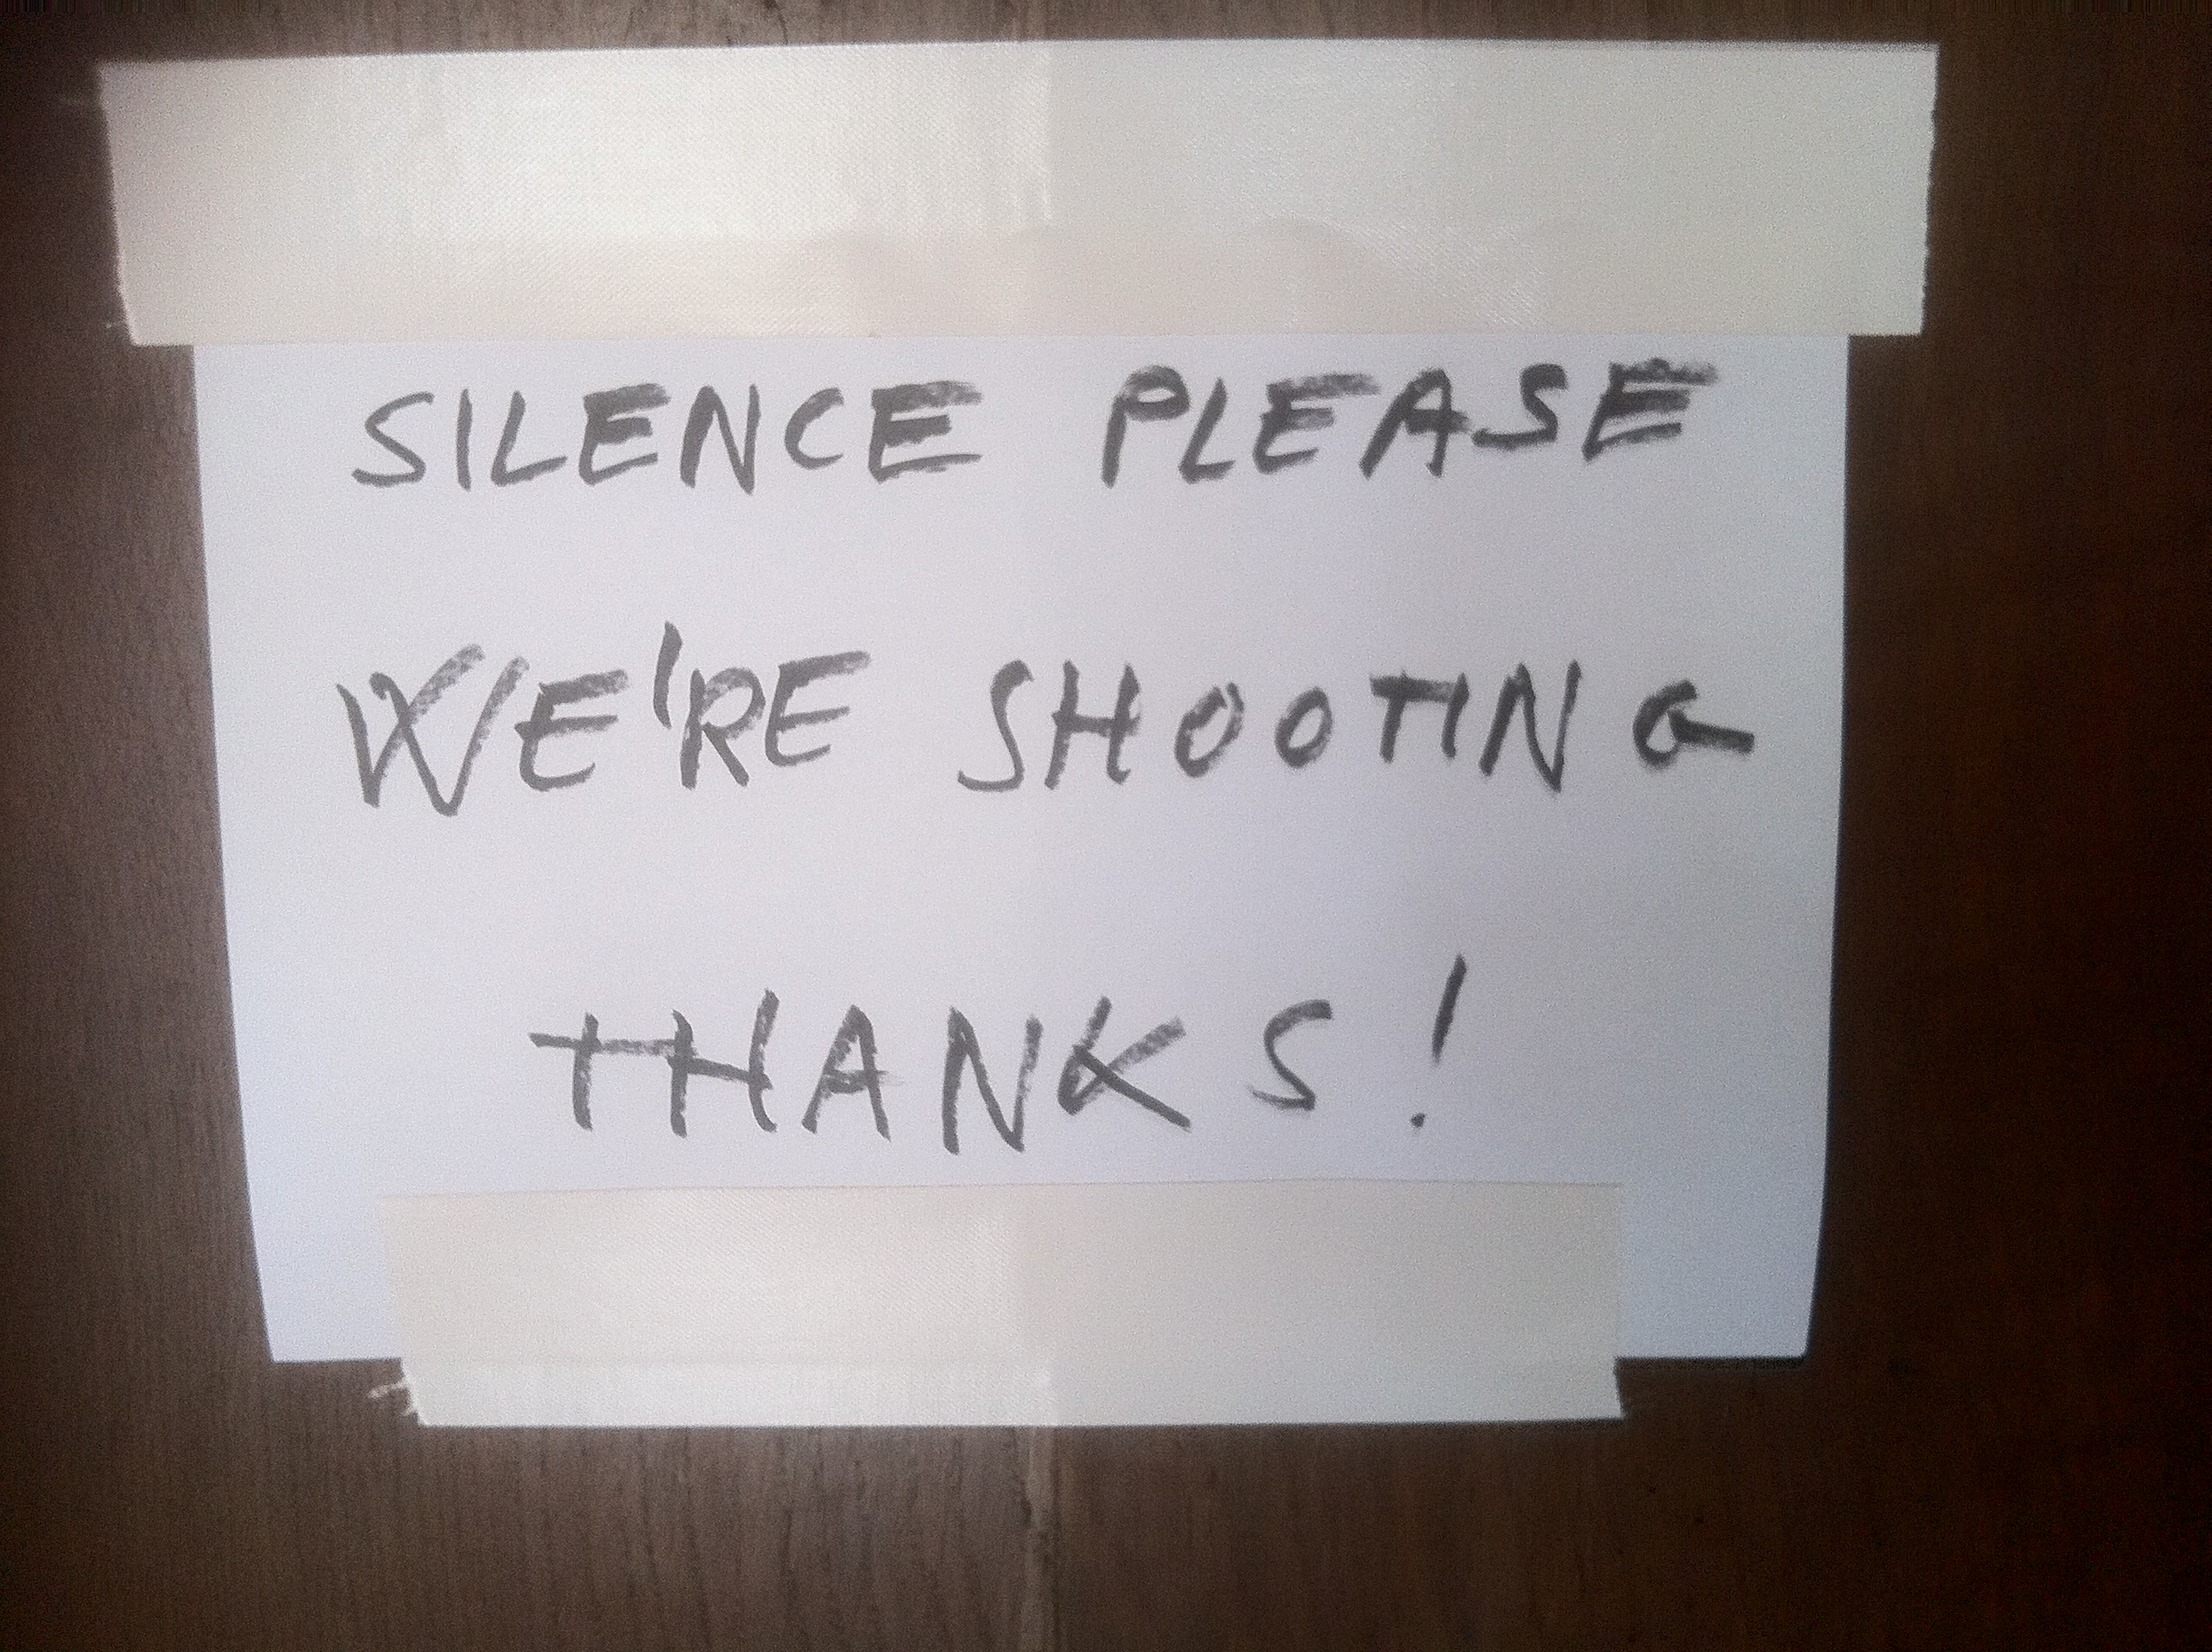 we're shooting